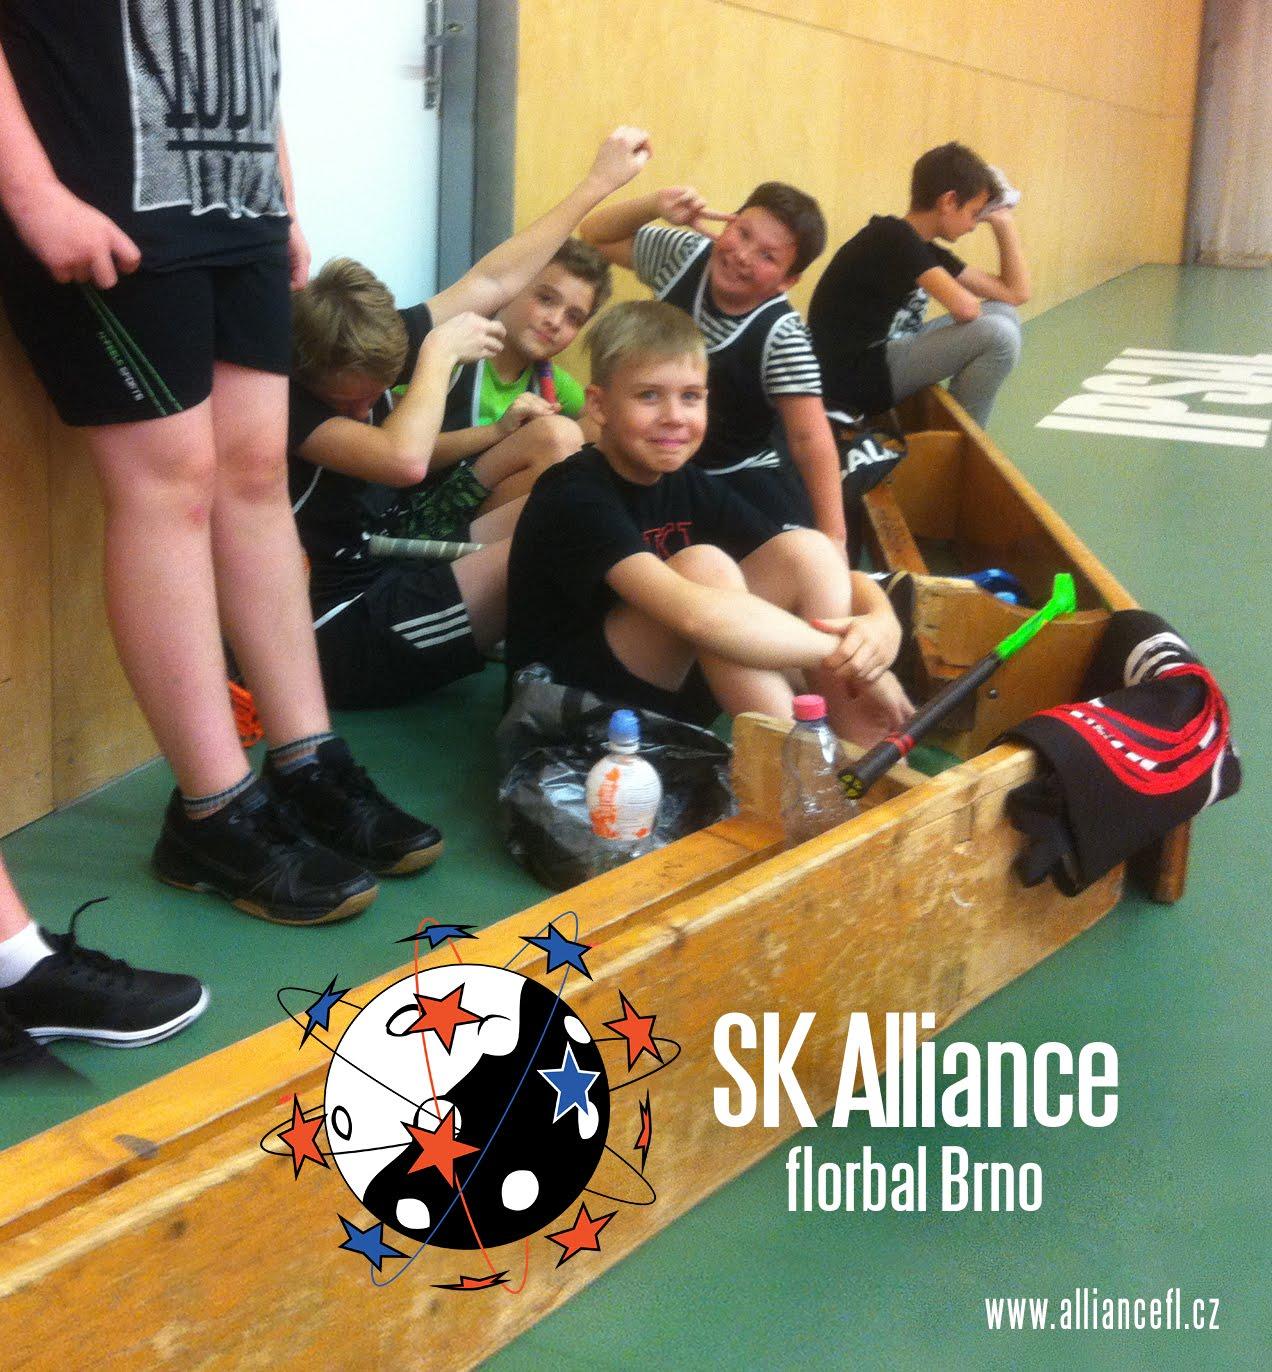 SK Alliance